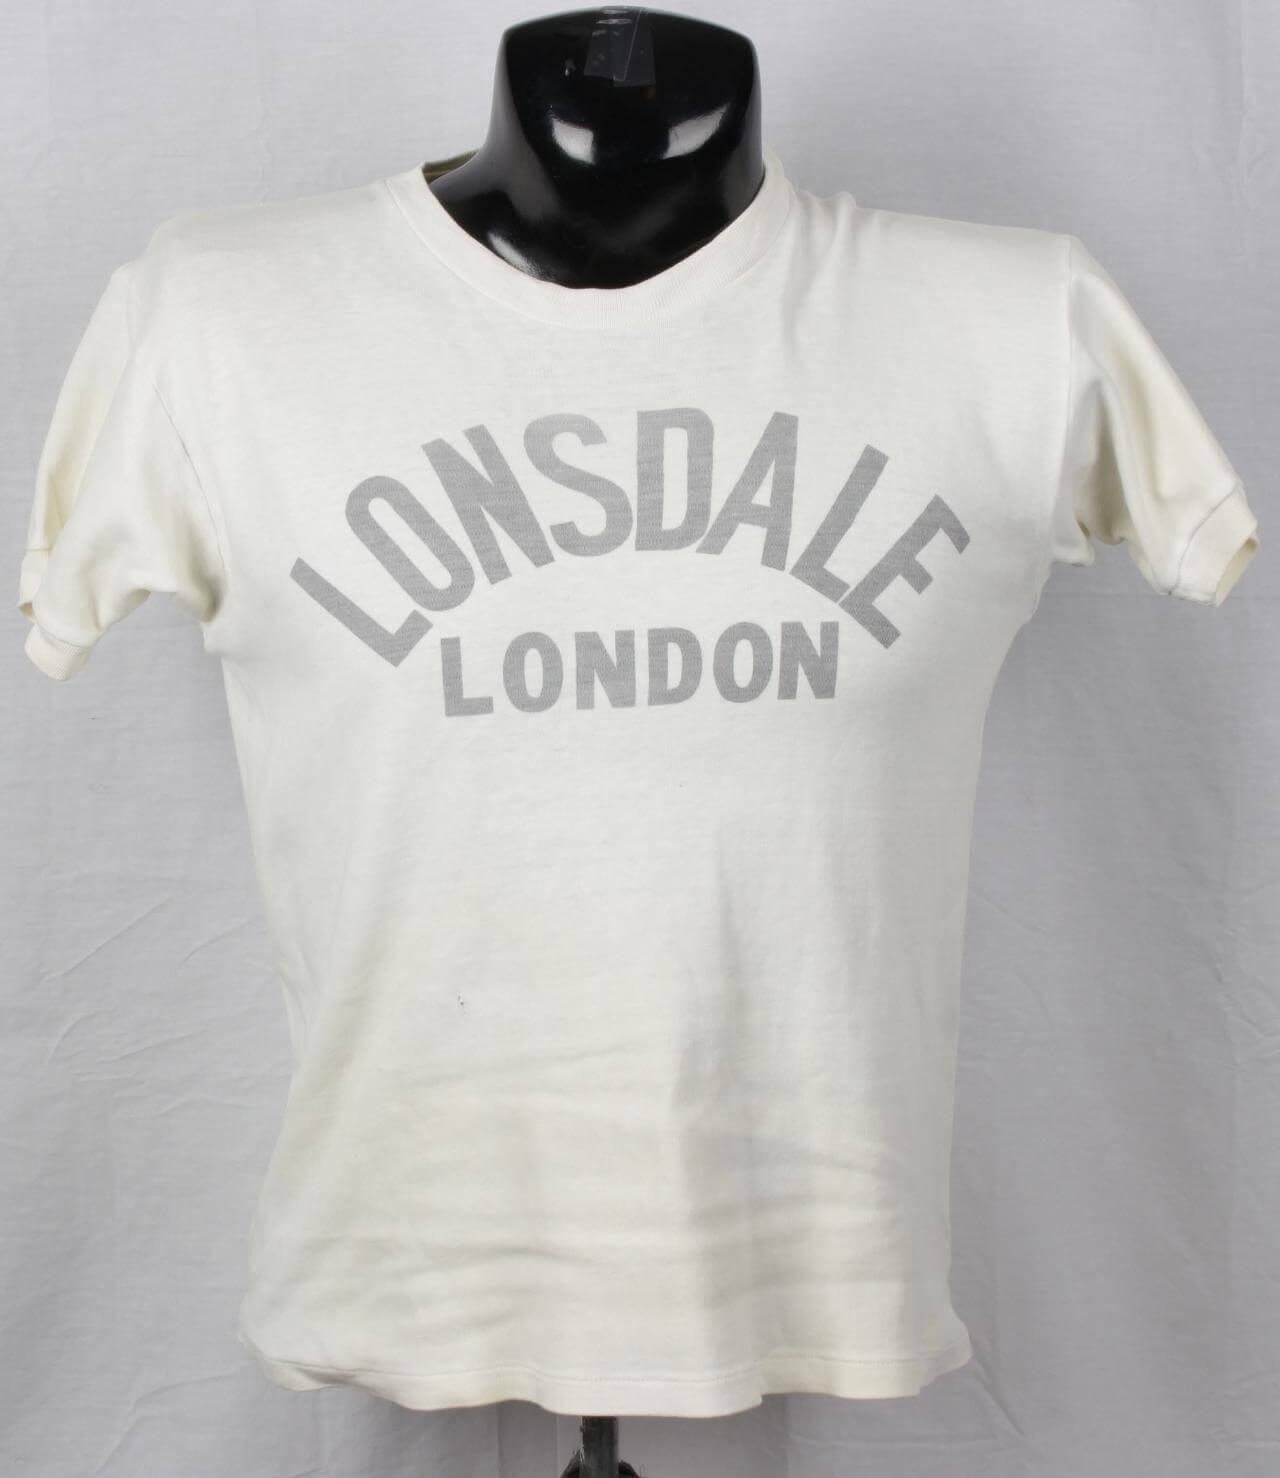 Ken Norton Fight Shirt Worn by Eddie Futch Lonsdale London (Futch Collection)